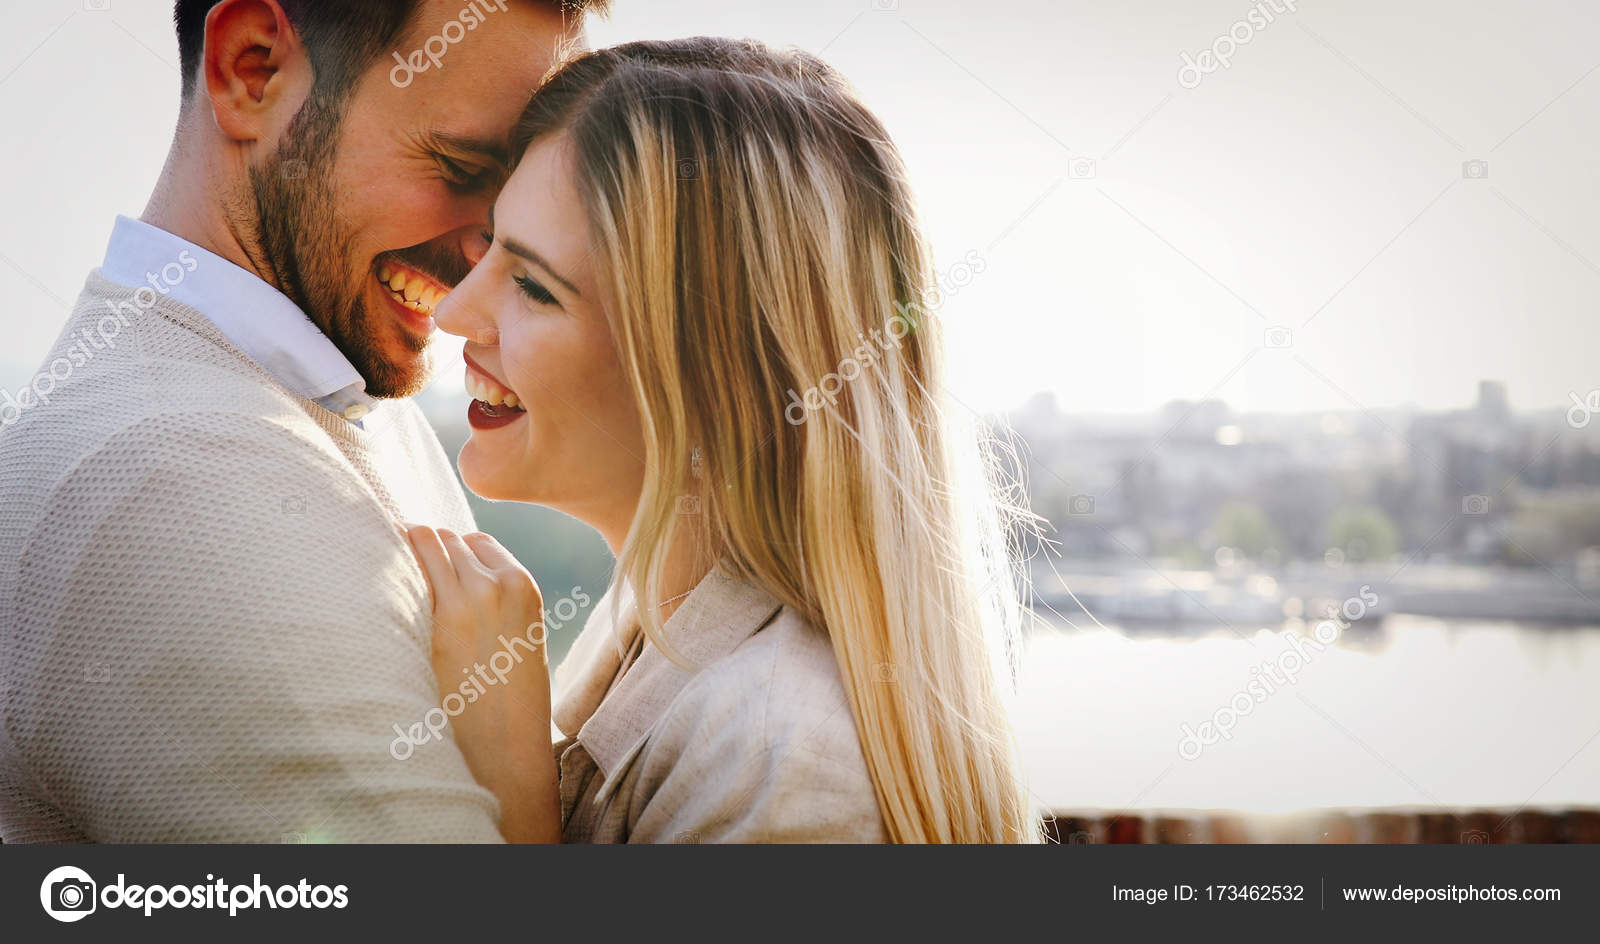 Знакомства для наружнох пар мадлен знакомства не курит